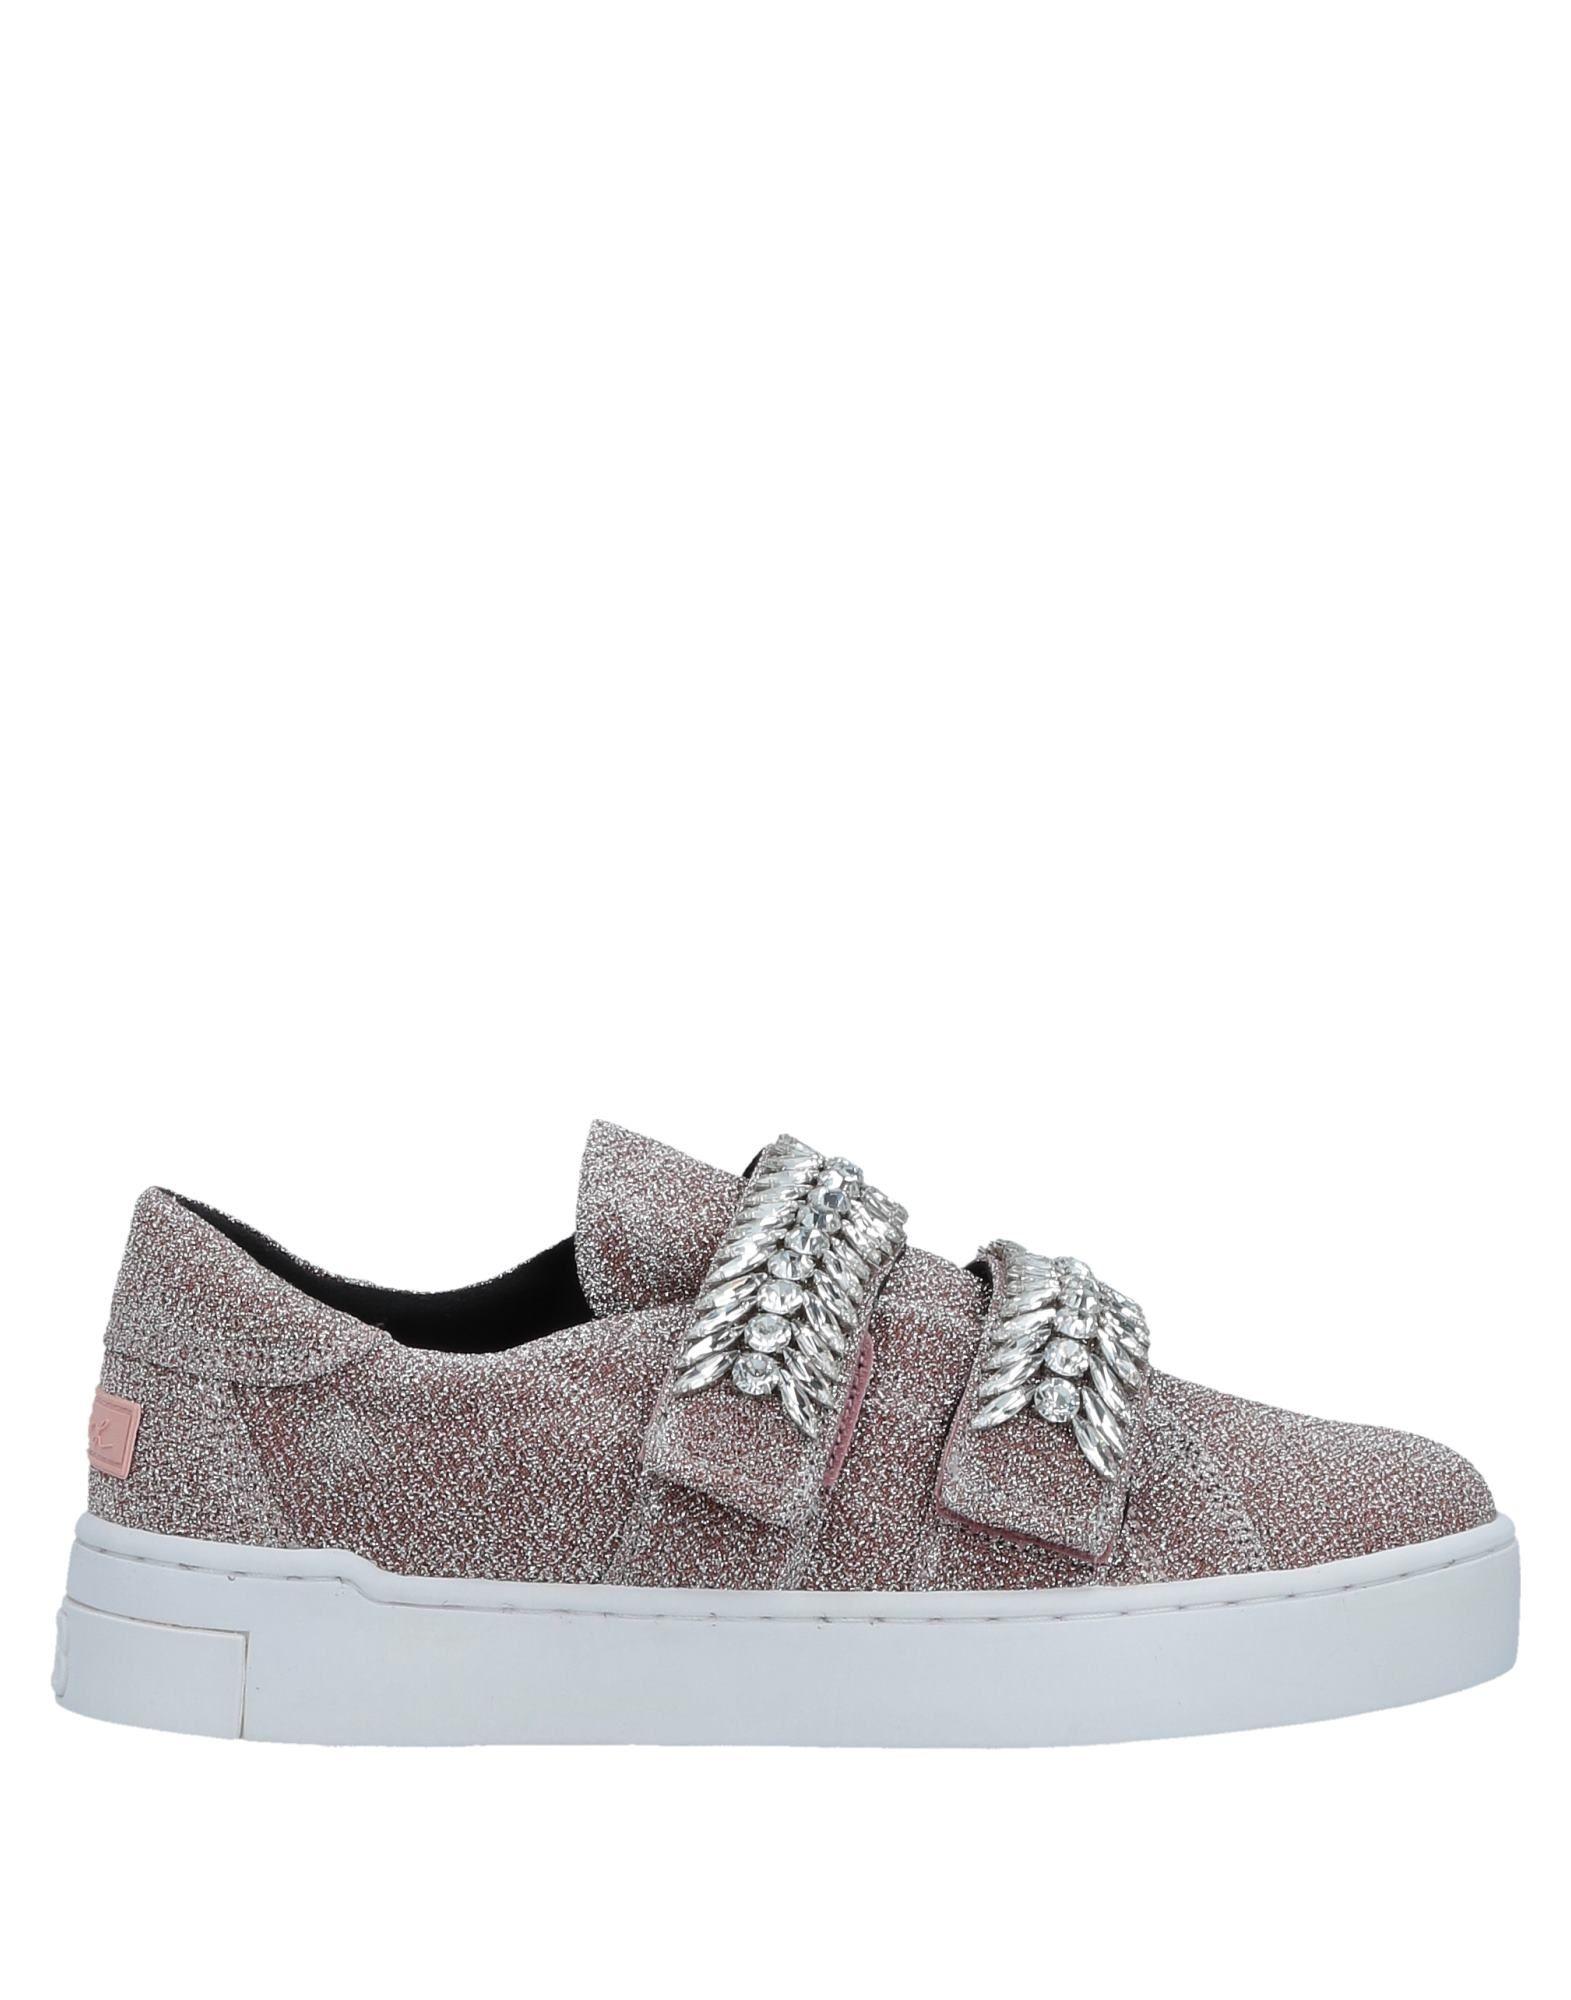 Suecomma Bonnie Sneakers Damen  11522233ANGut aussehende strapazierfähige Schuhe